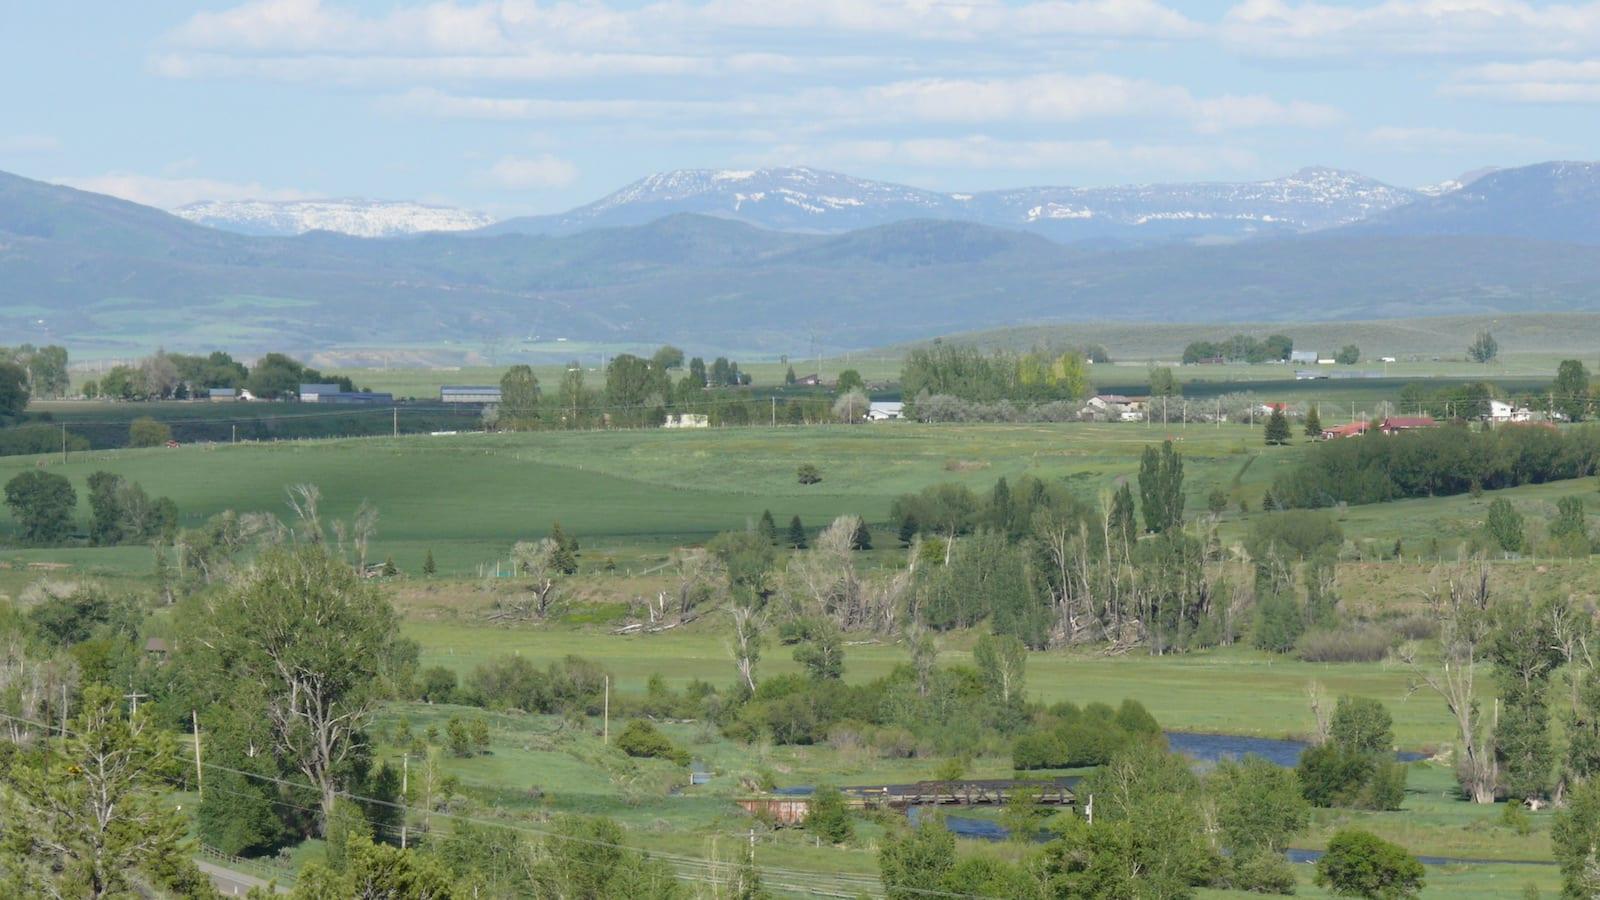 White River Valley Meeker Colorado Flat Top Mountains